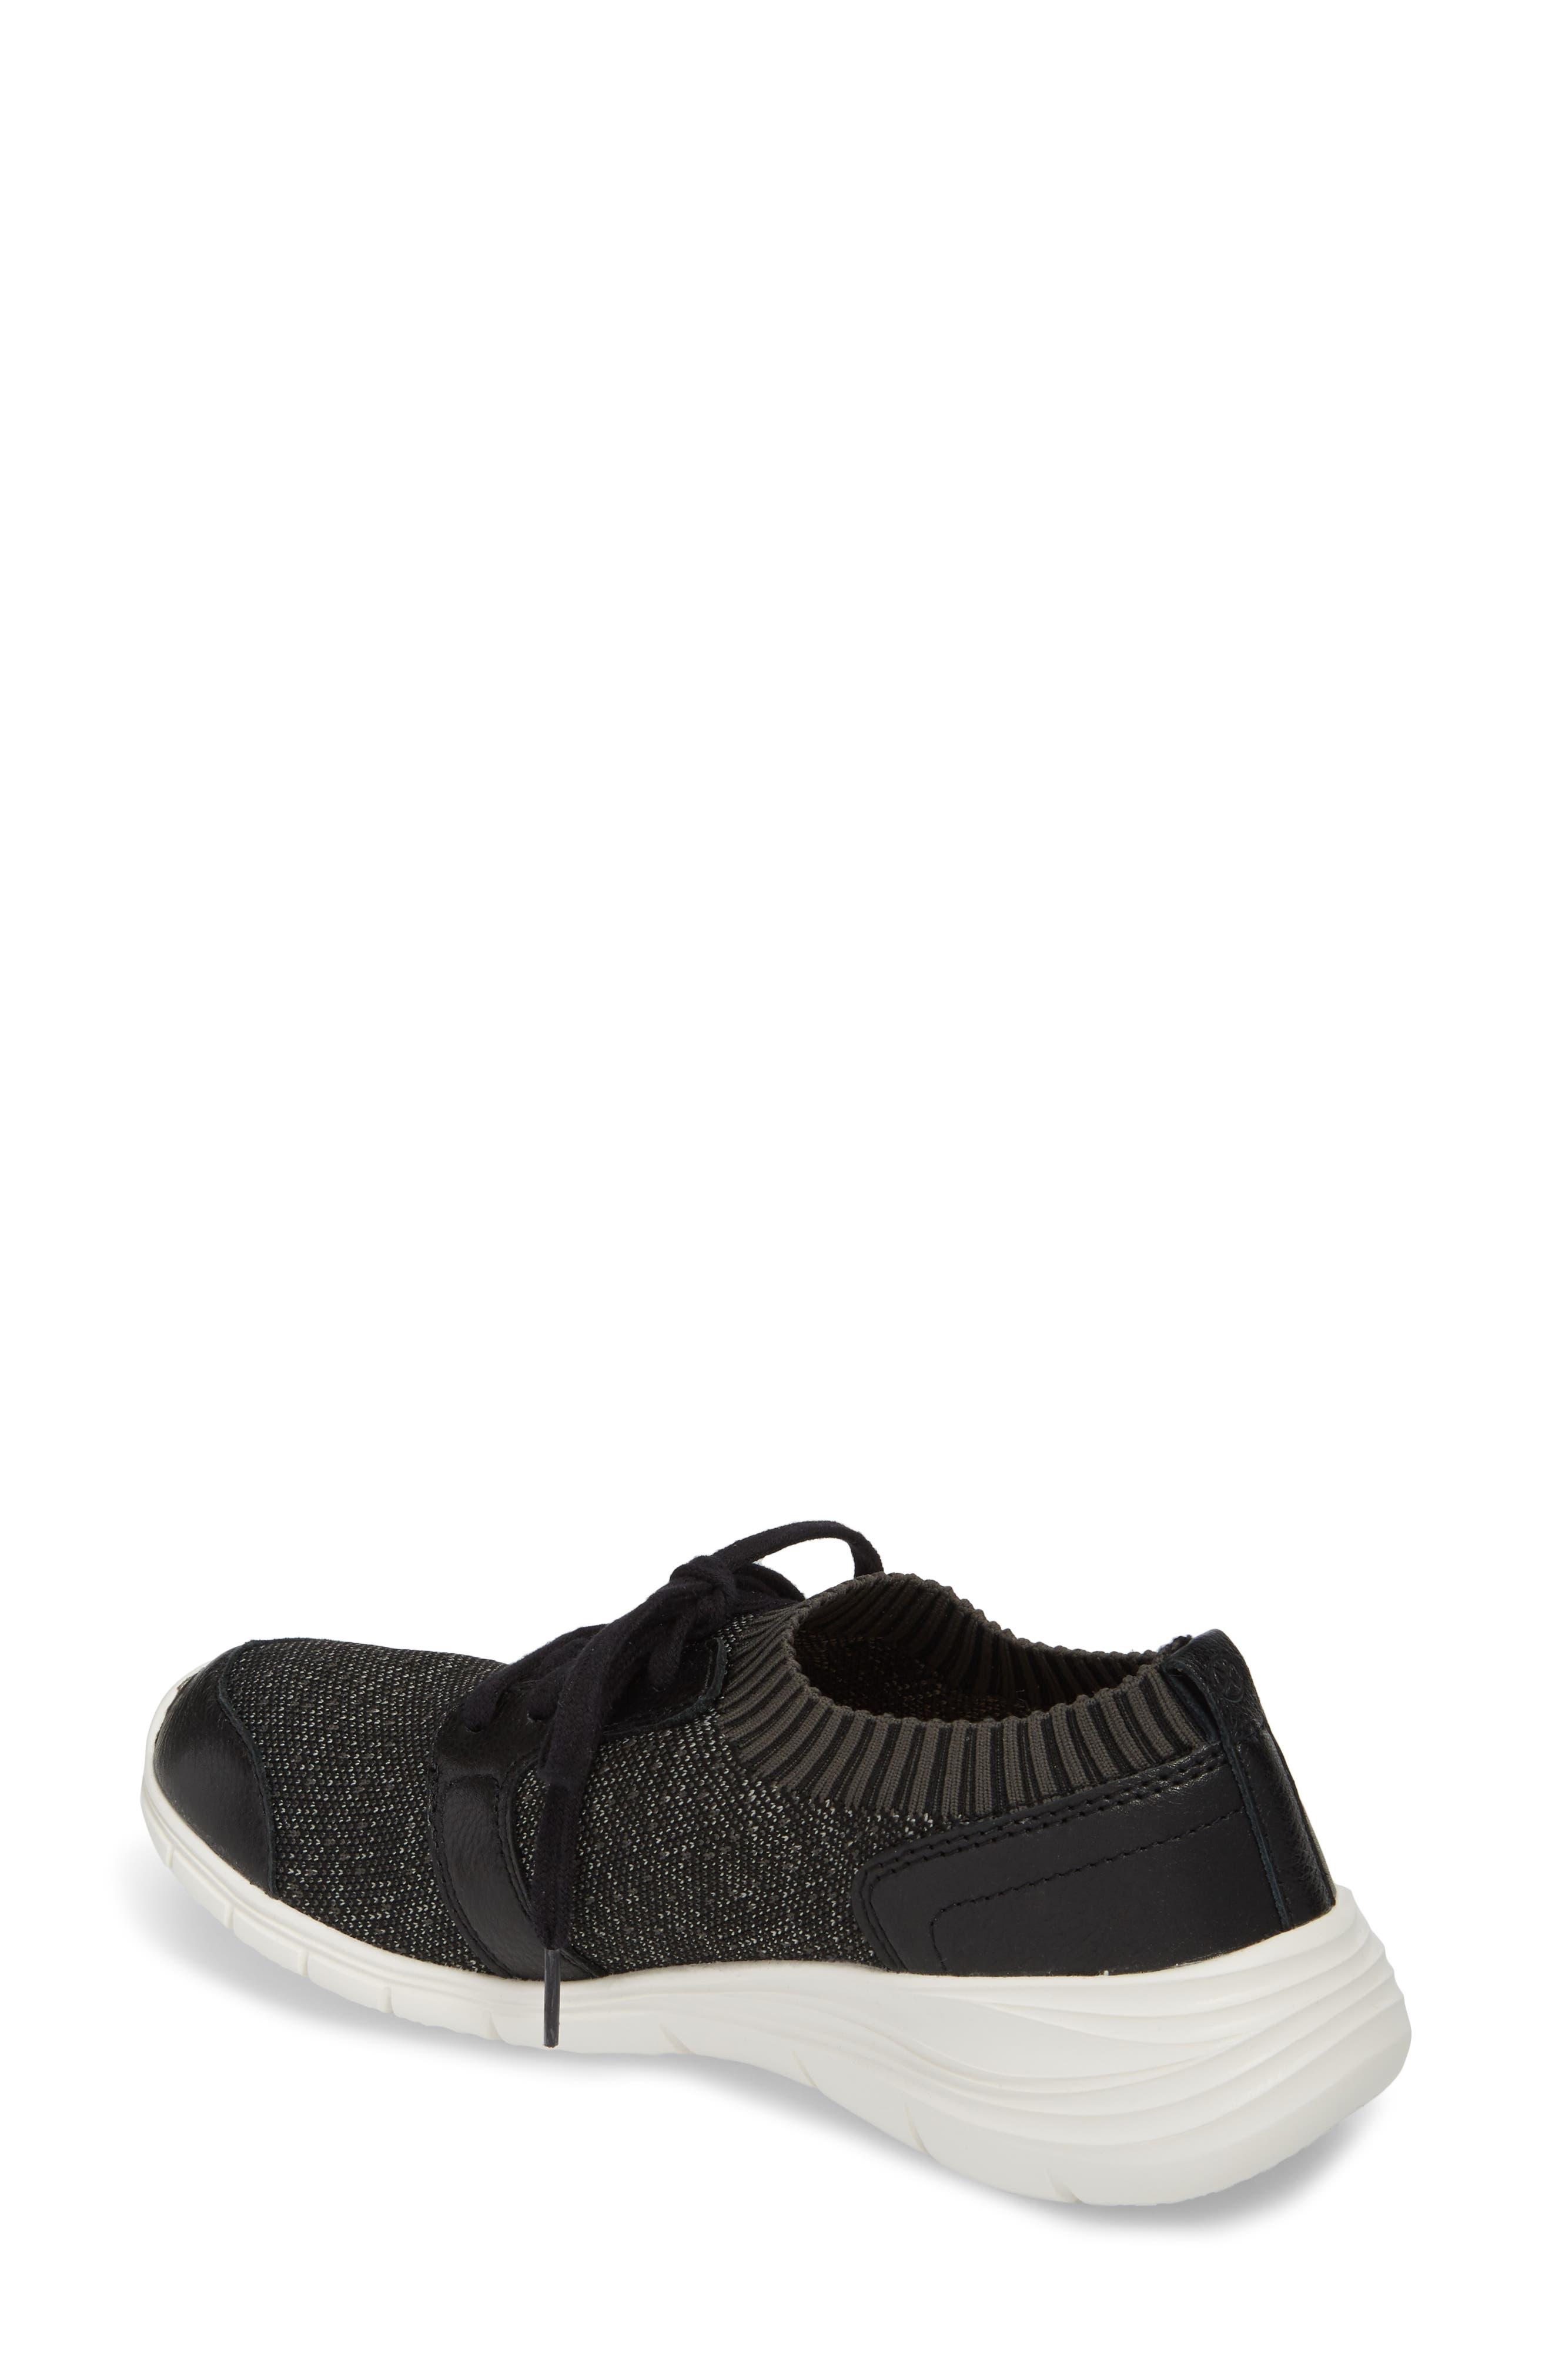 Cypress Knit Sneaker,                             Alternate thumbnail 2, color,                             BLACK FABRIC